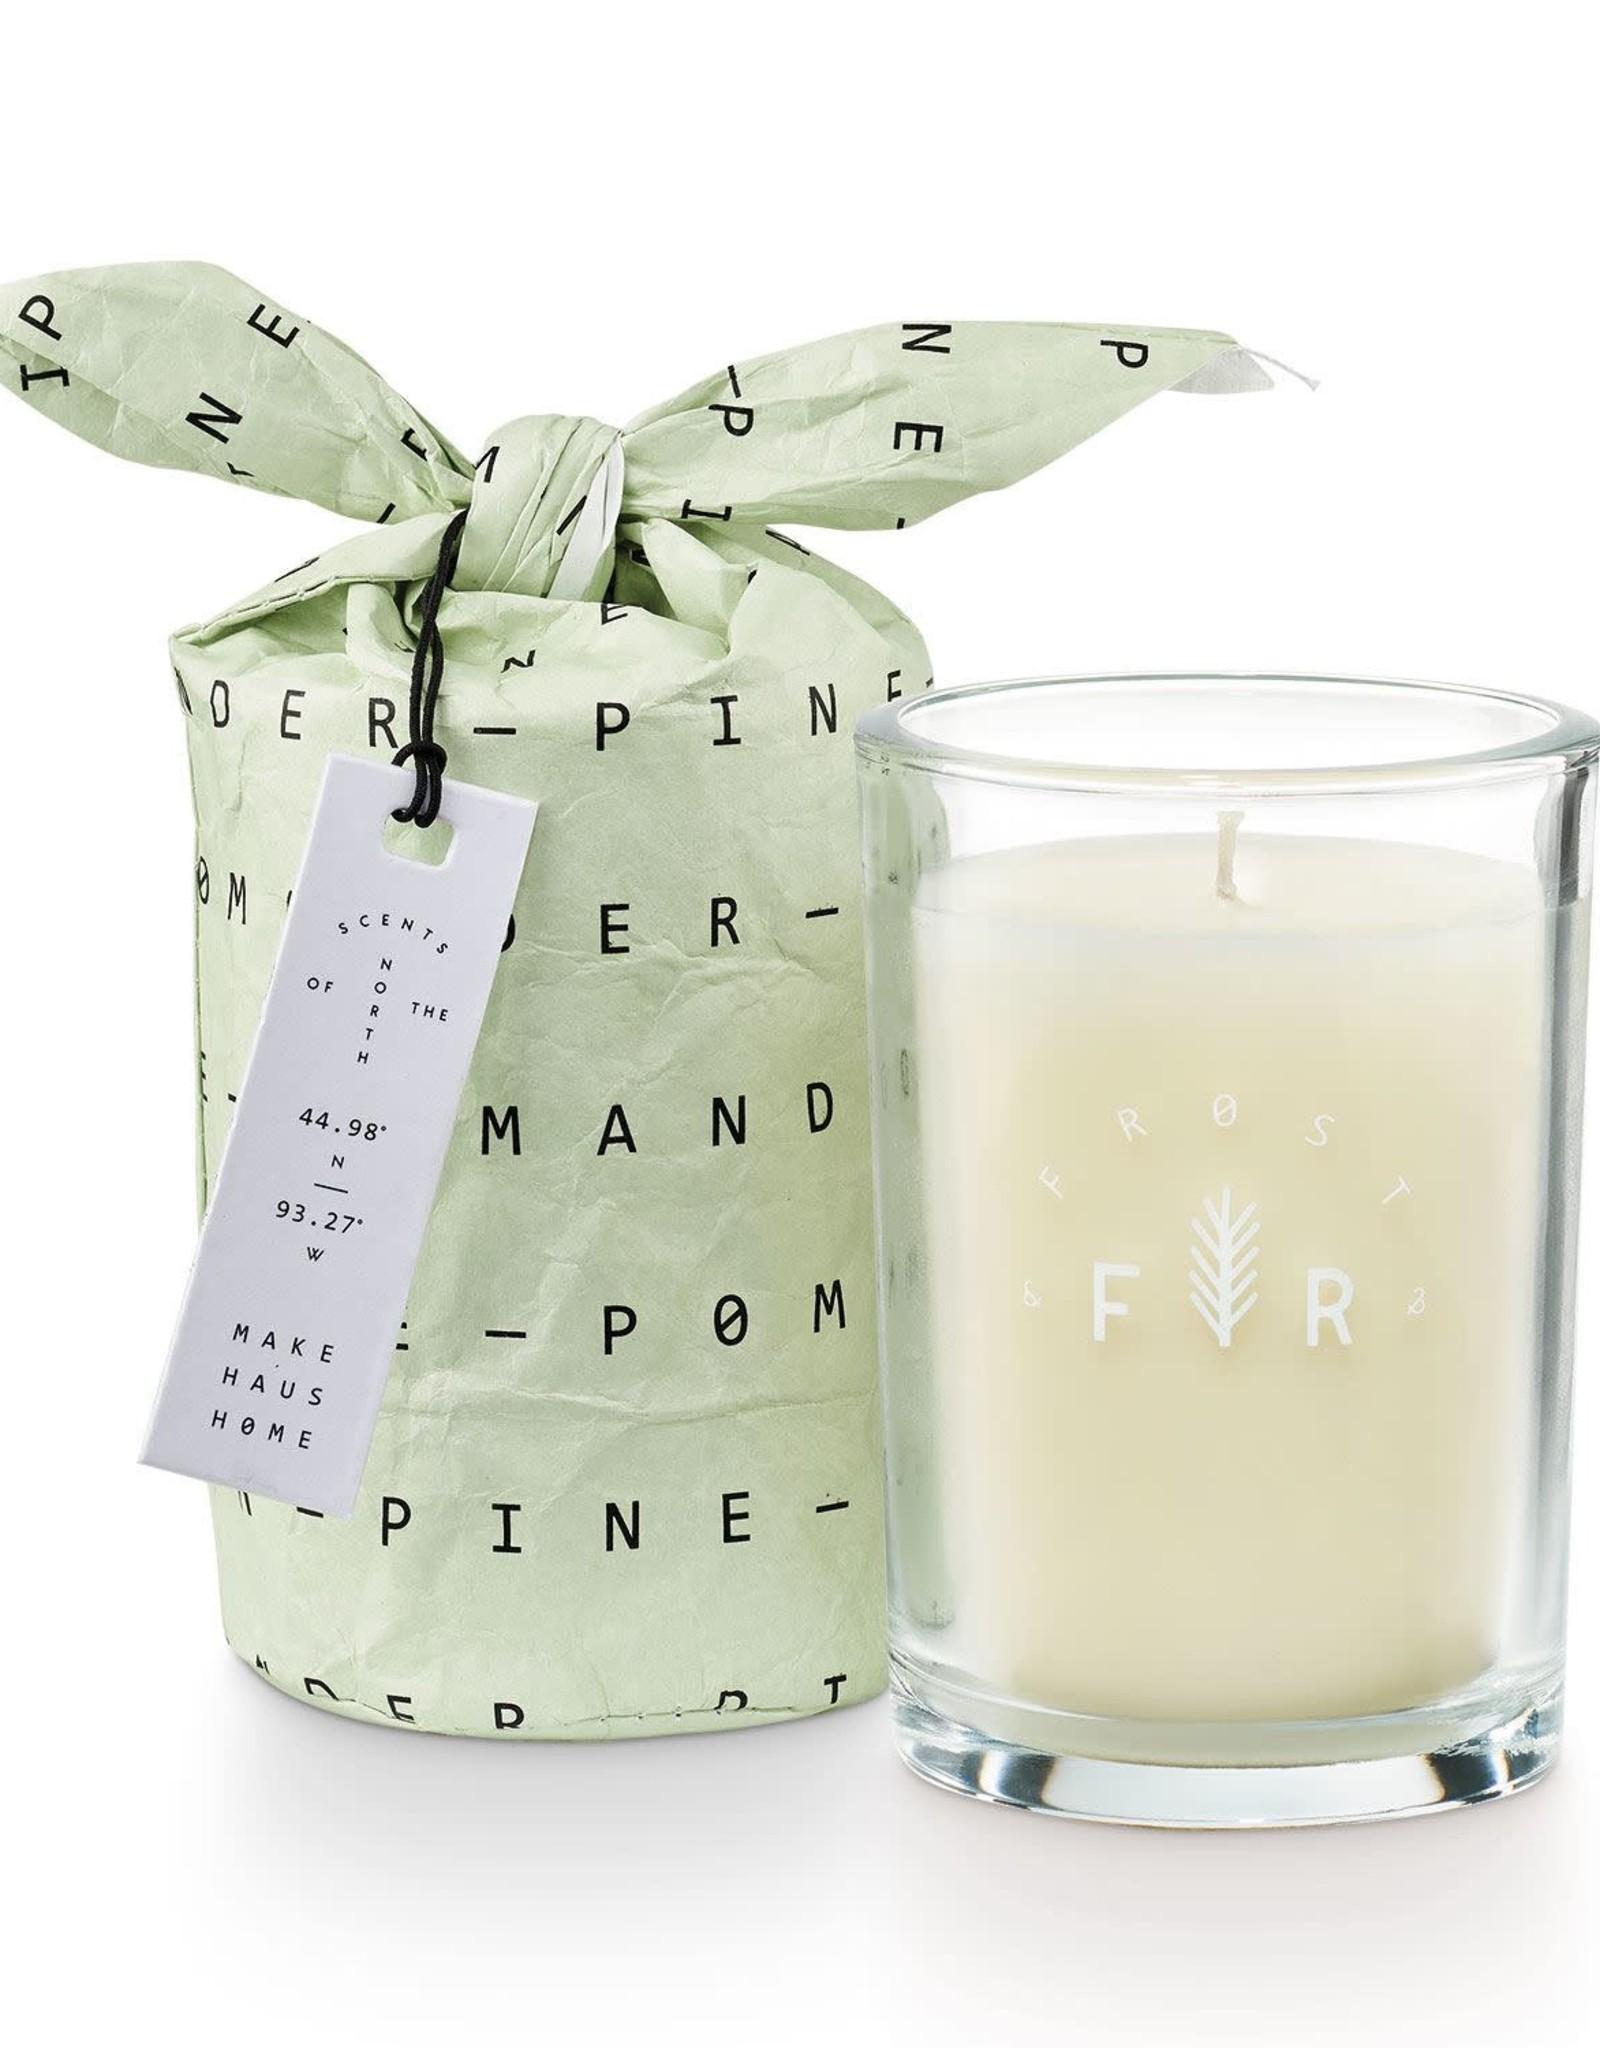 Pomander Pine Bundled Glass Candle